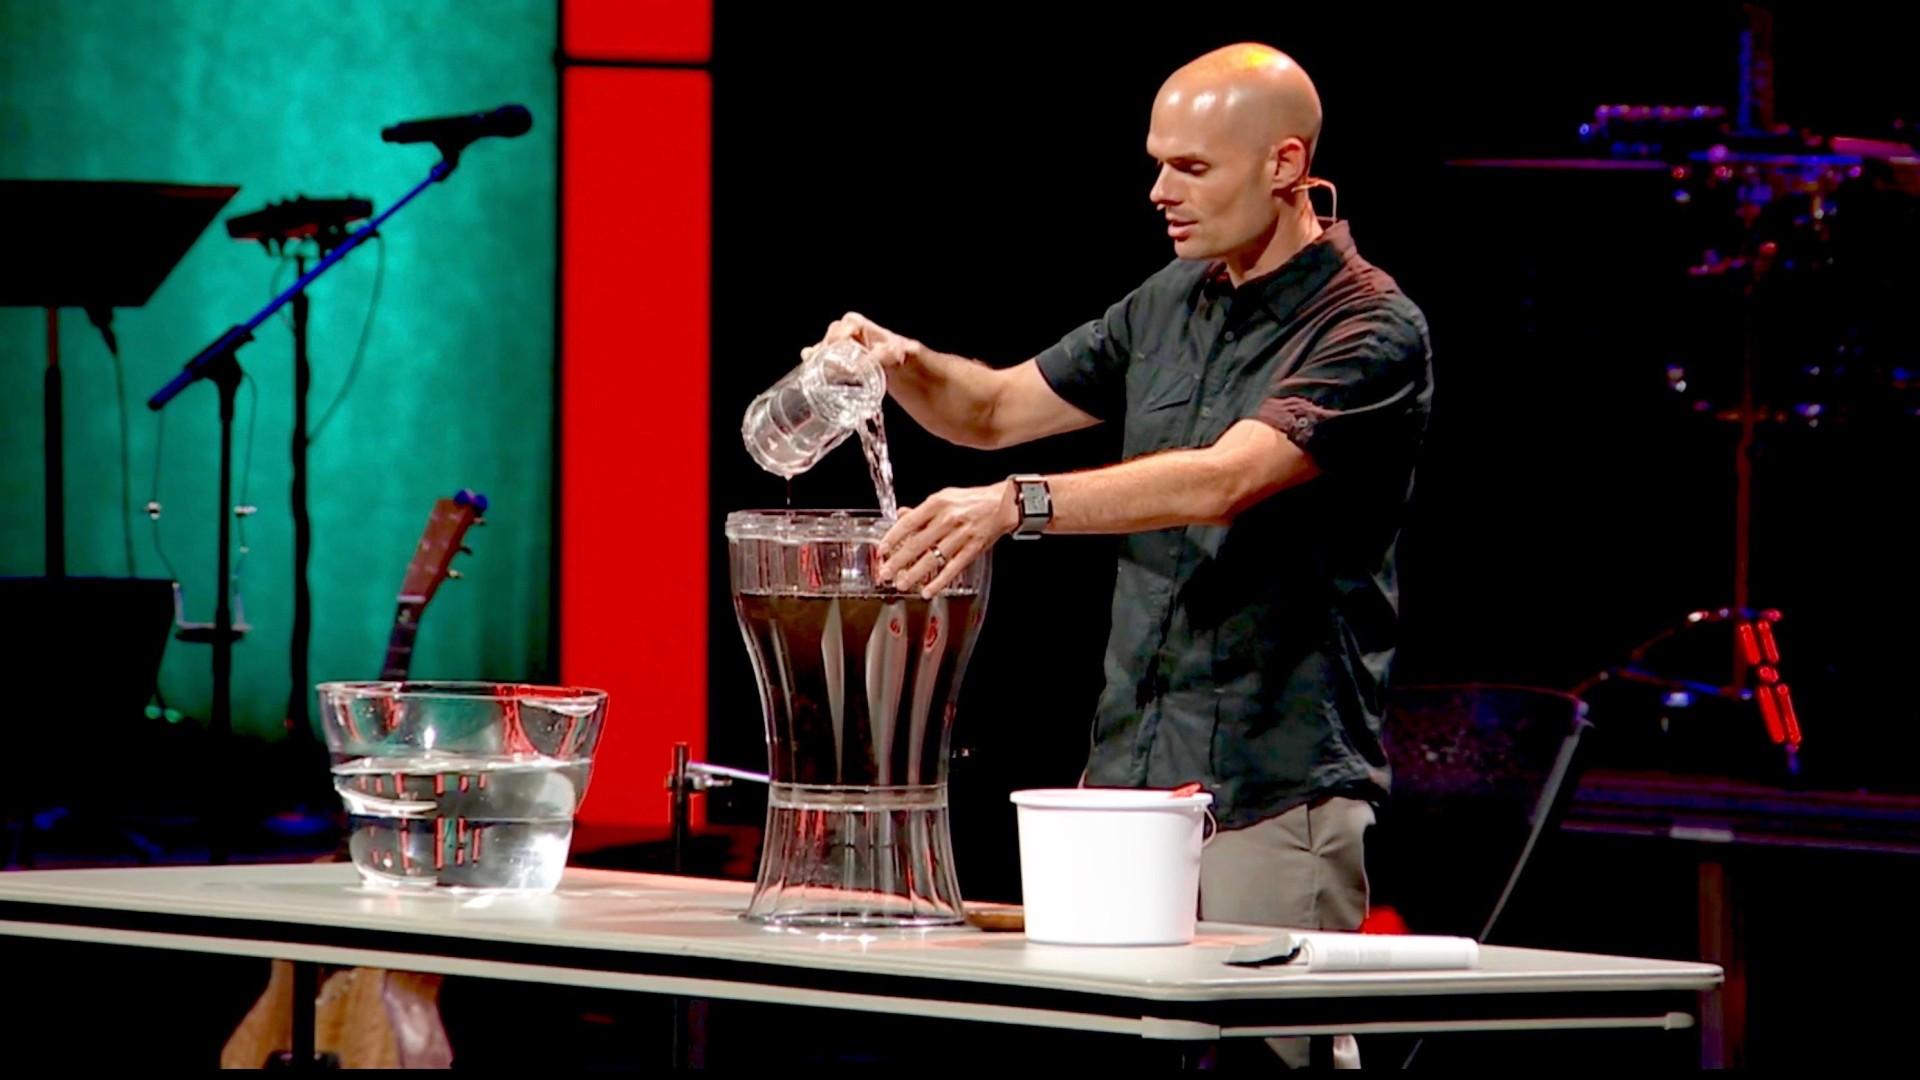 Pour It Out Teaching Shot